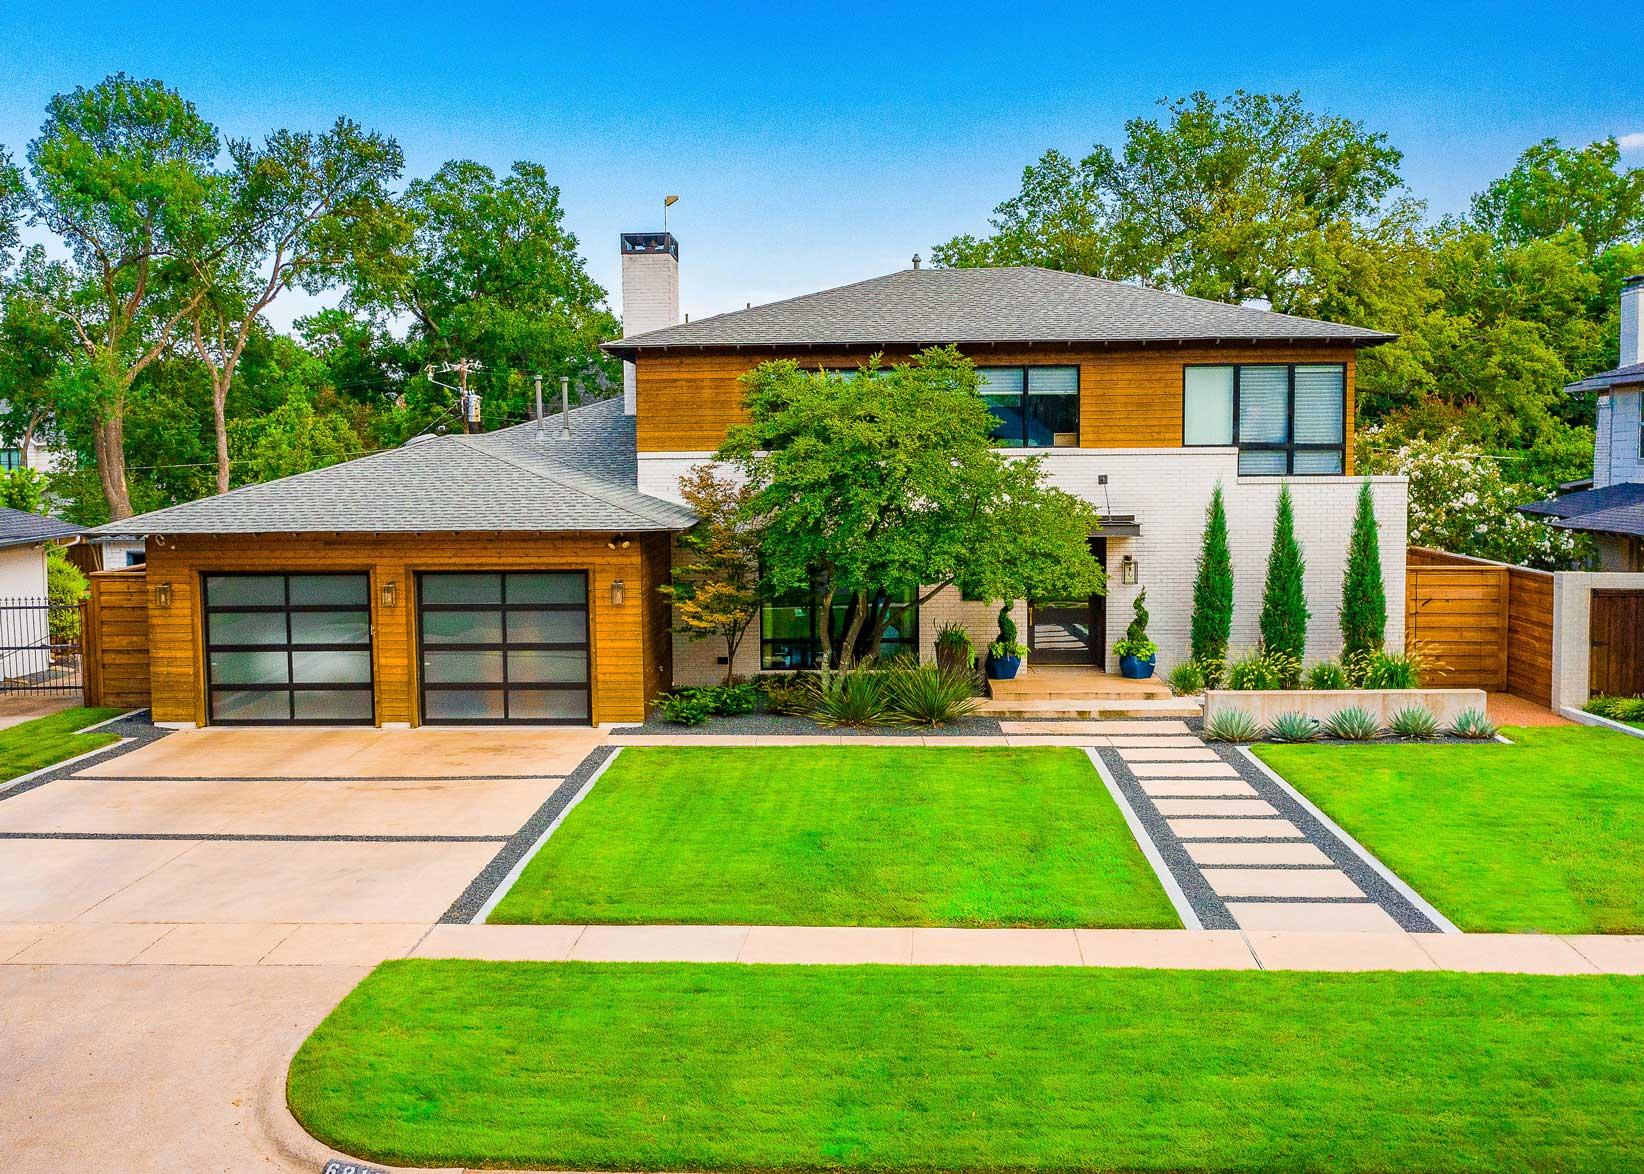 richardson-texas-landscaping-company